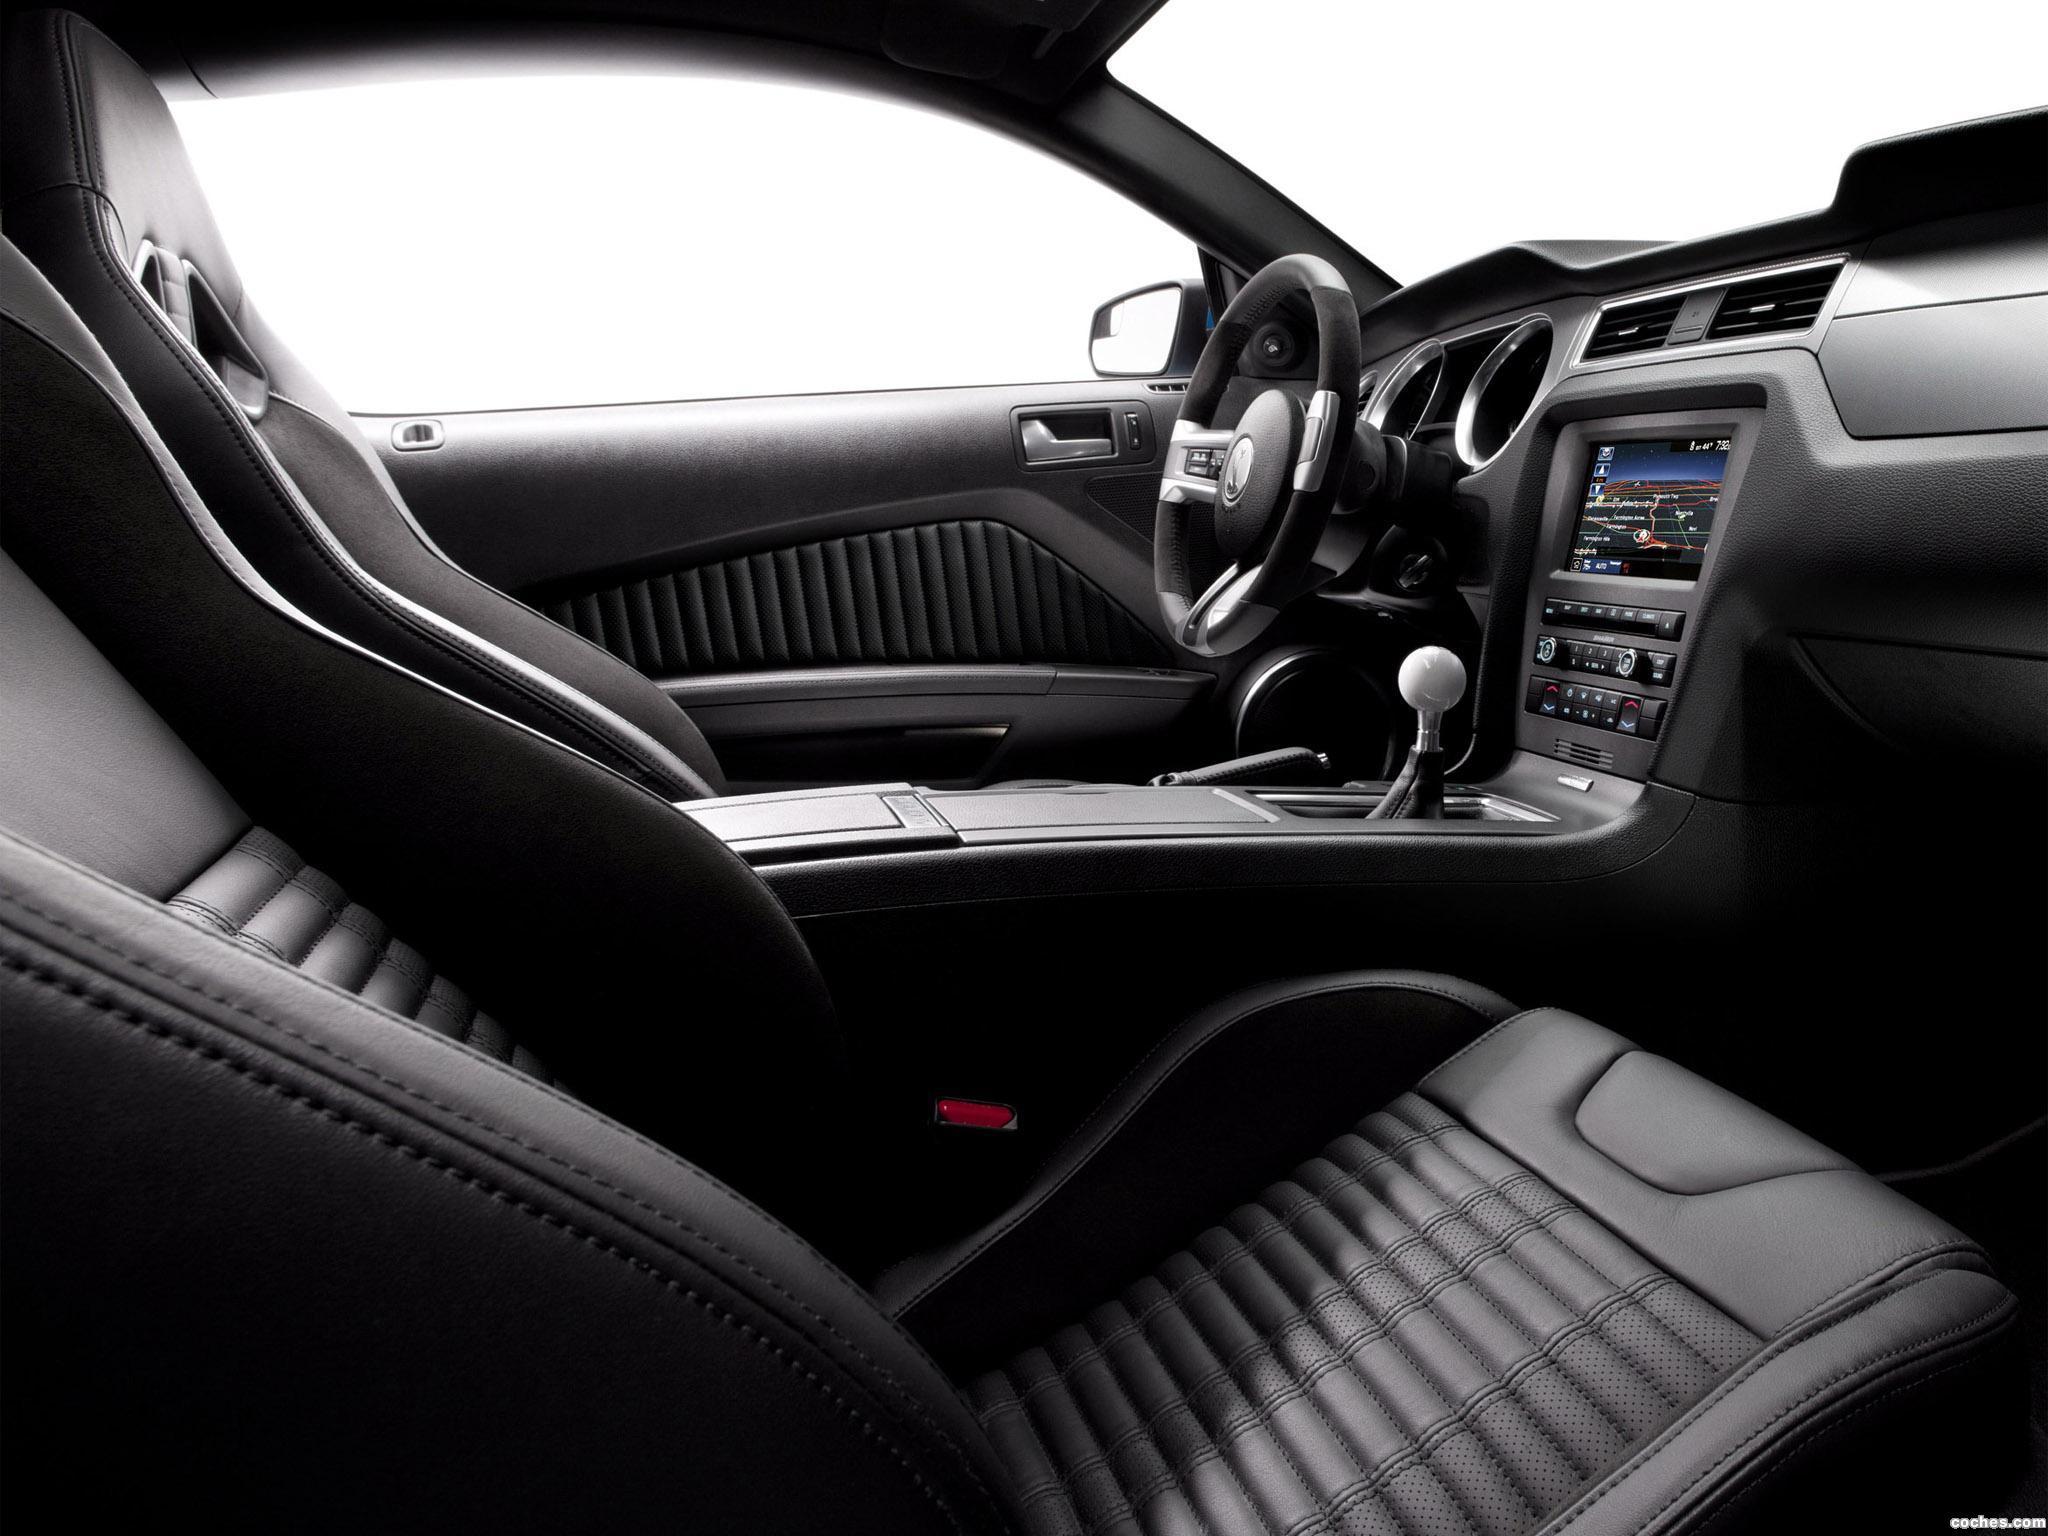 Foto 14 de Ford Shelby Mustang GT500 SVT 2012